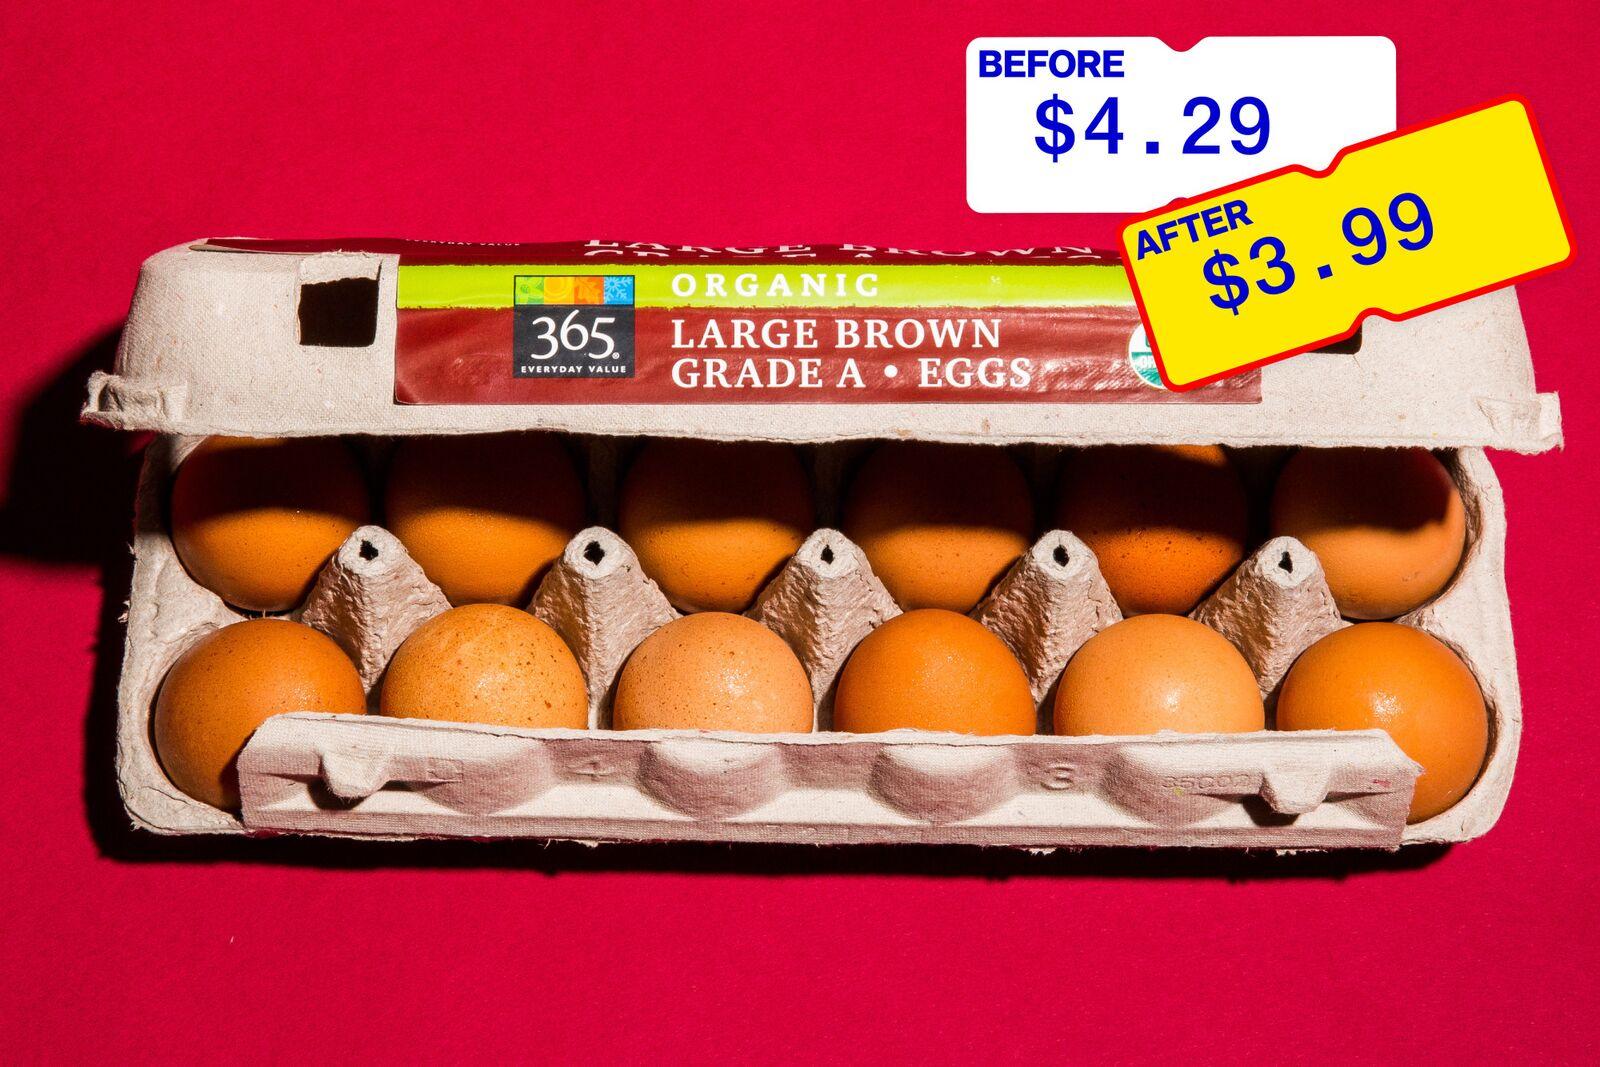 1503930159_web_wf-eggs